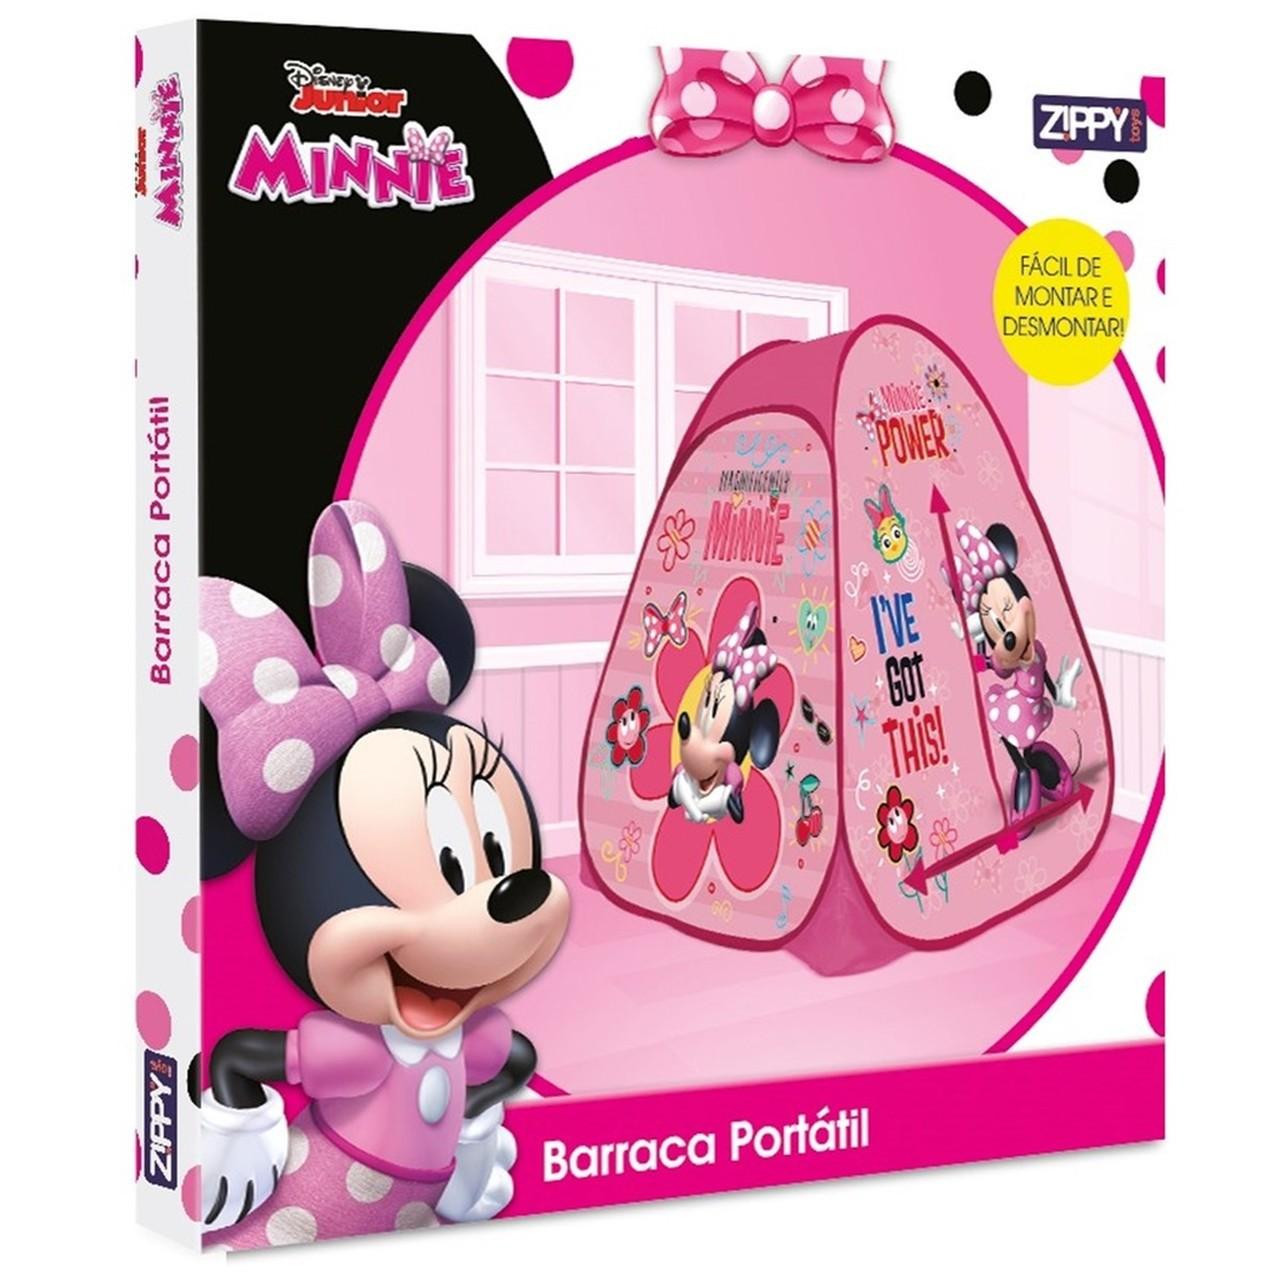 Barraca Infantil Minnie Tenda Portátil Pop-up - Zippy 6930